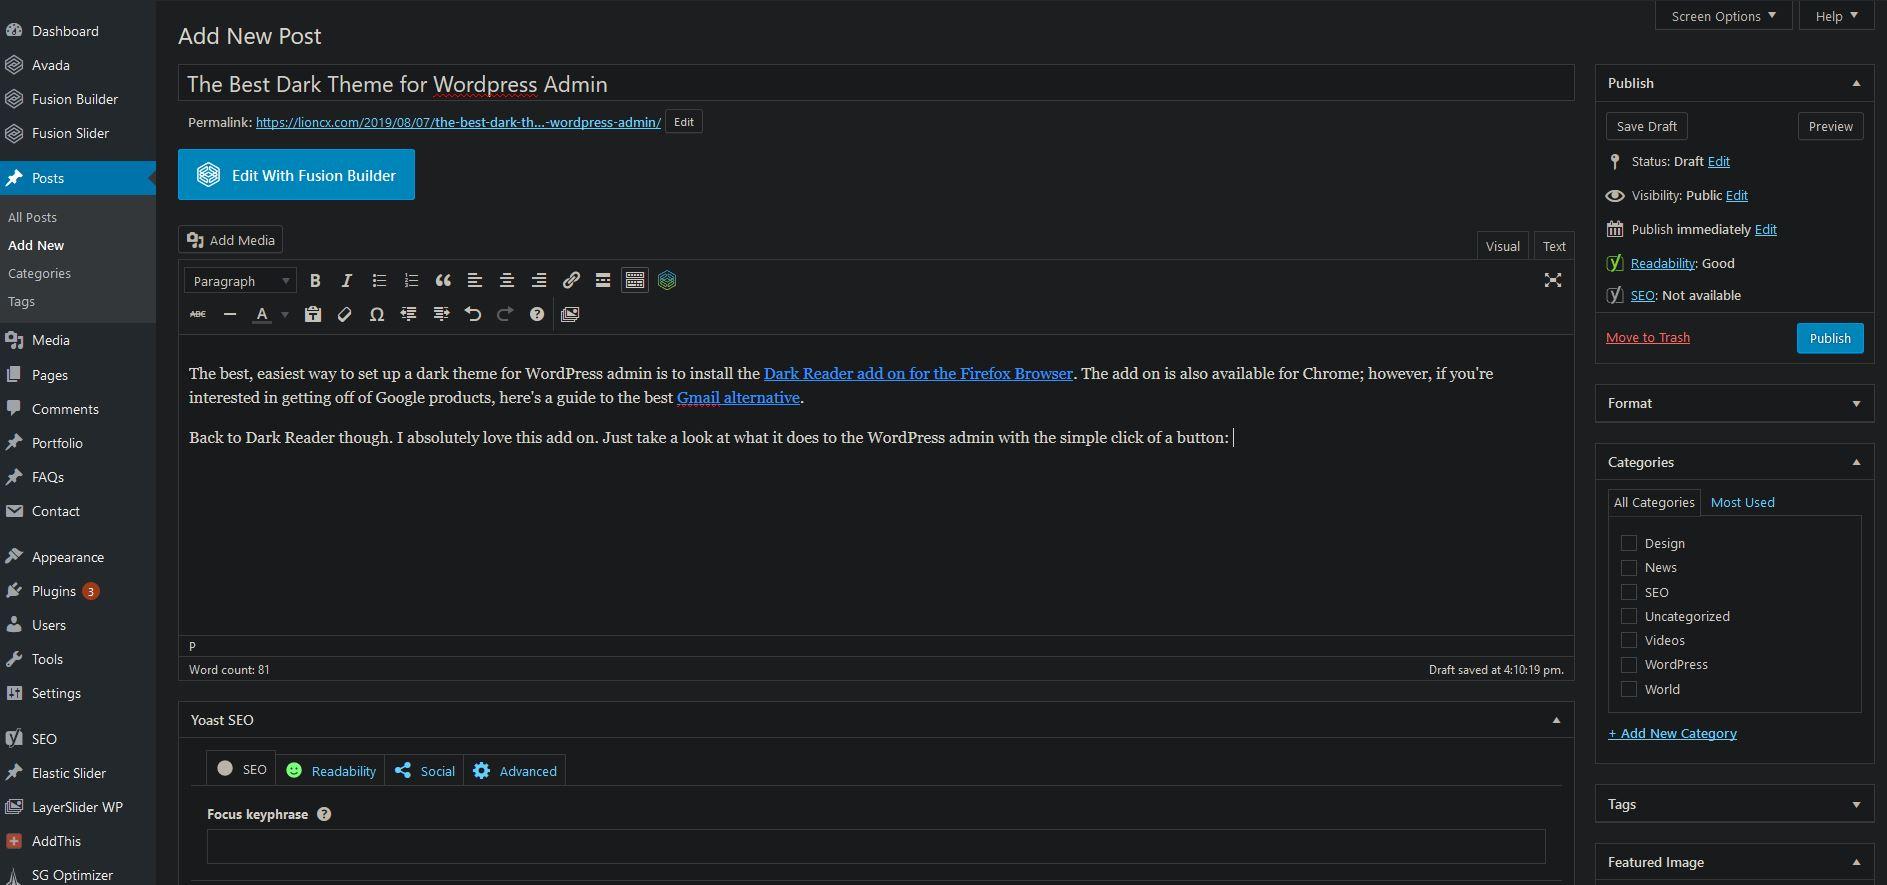 Dark Theme for WordPress Admin